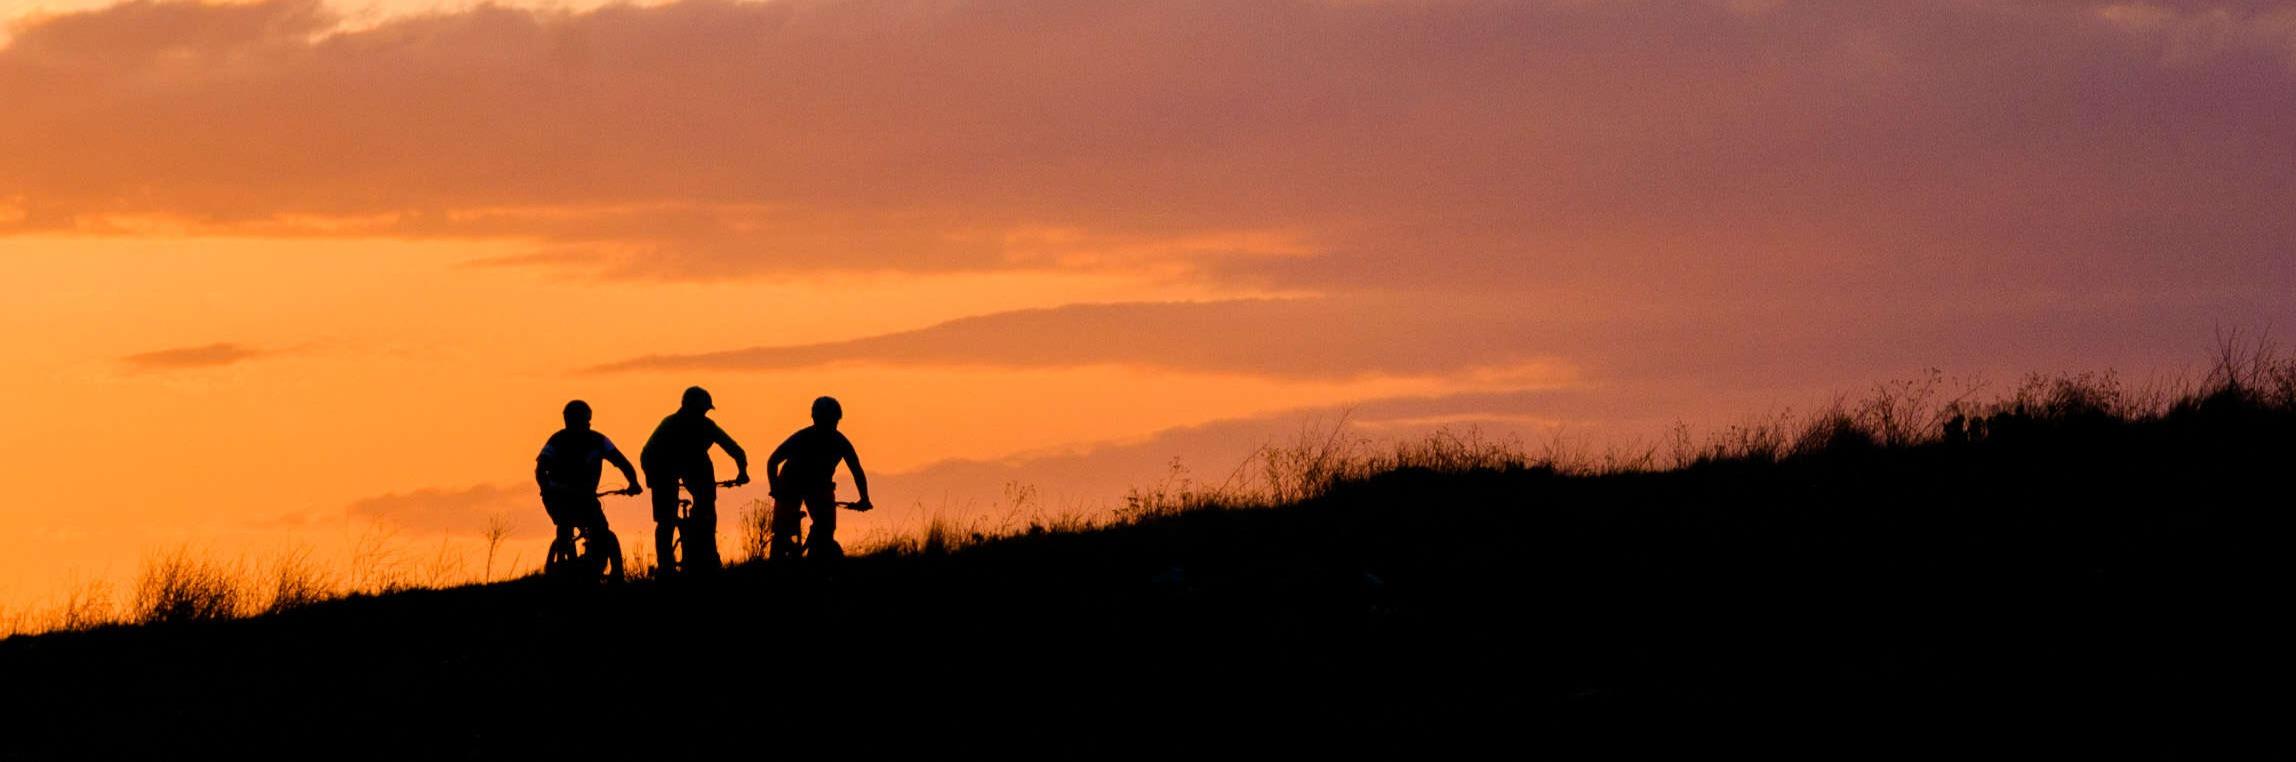 three mountain bikes riding at sunset